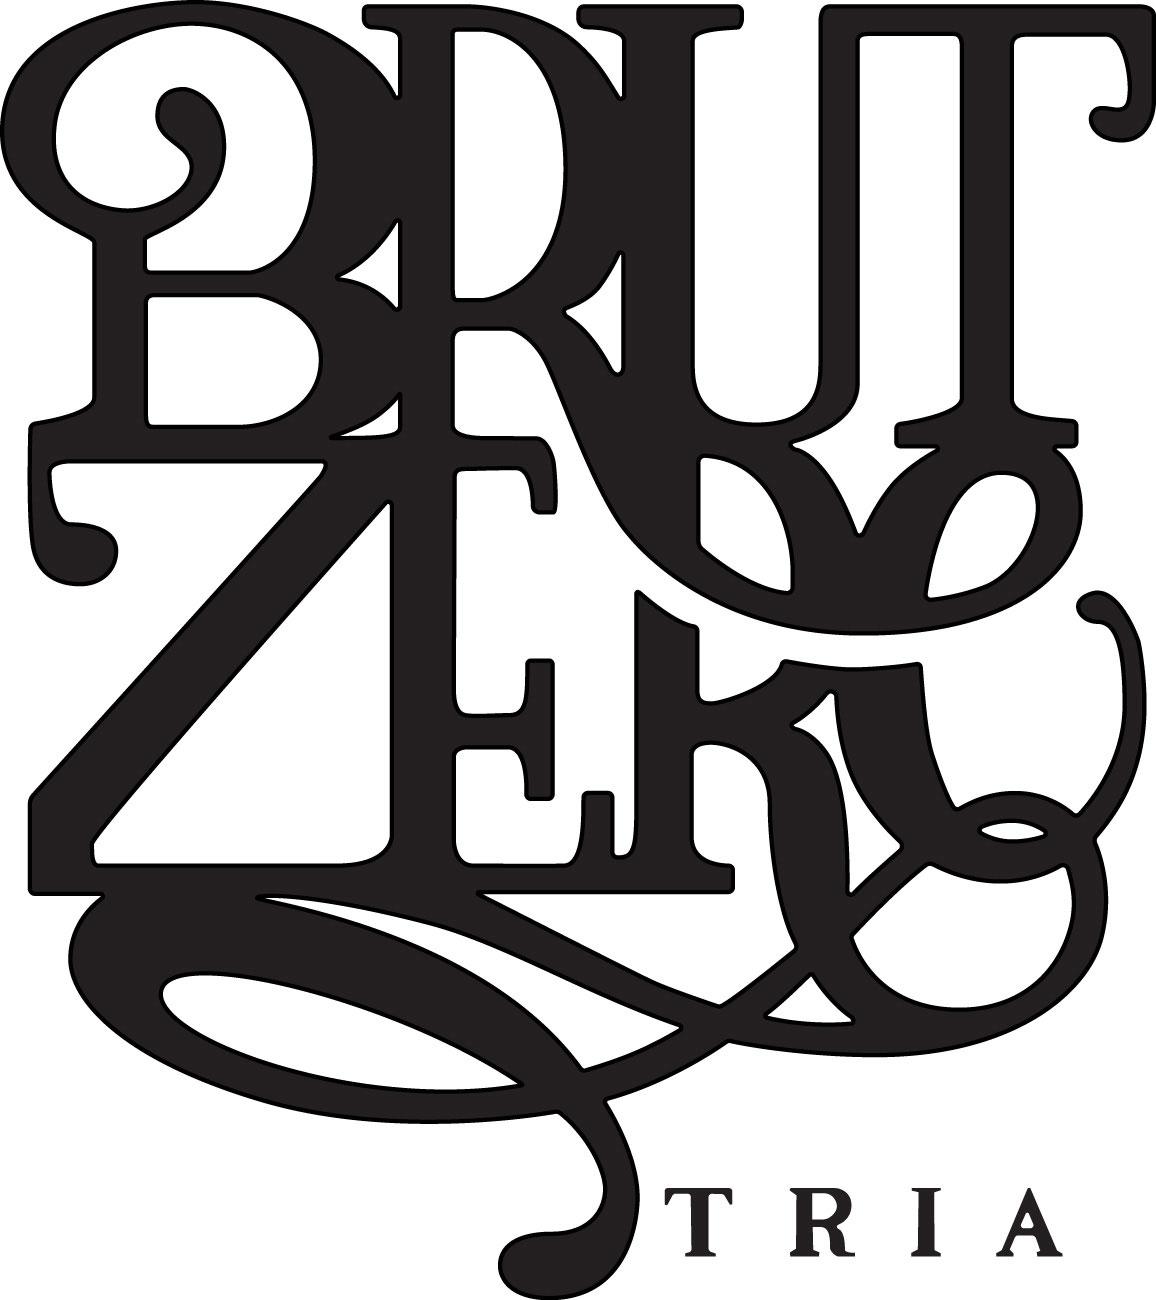 brutzero_label_wine_tria_bespoke.jpg